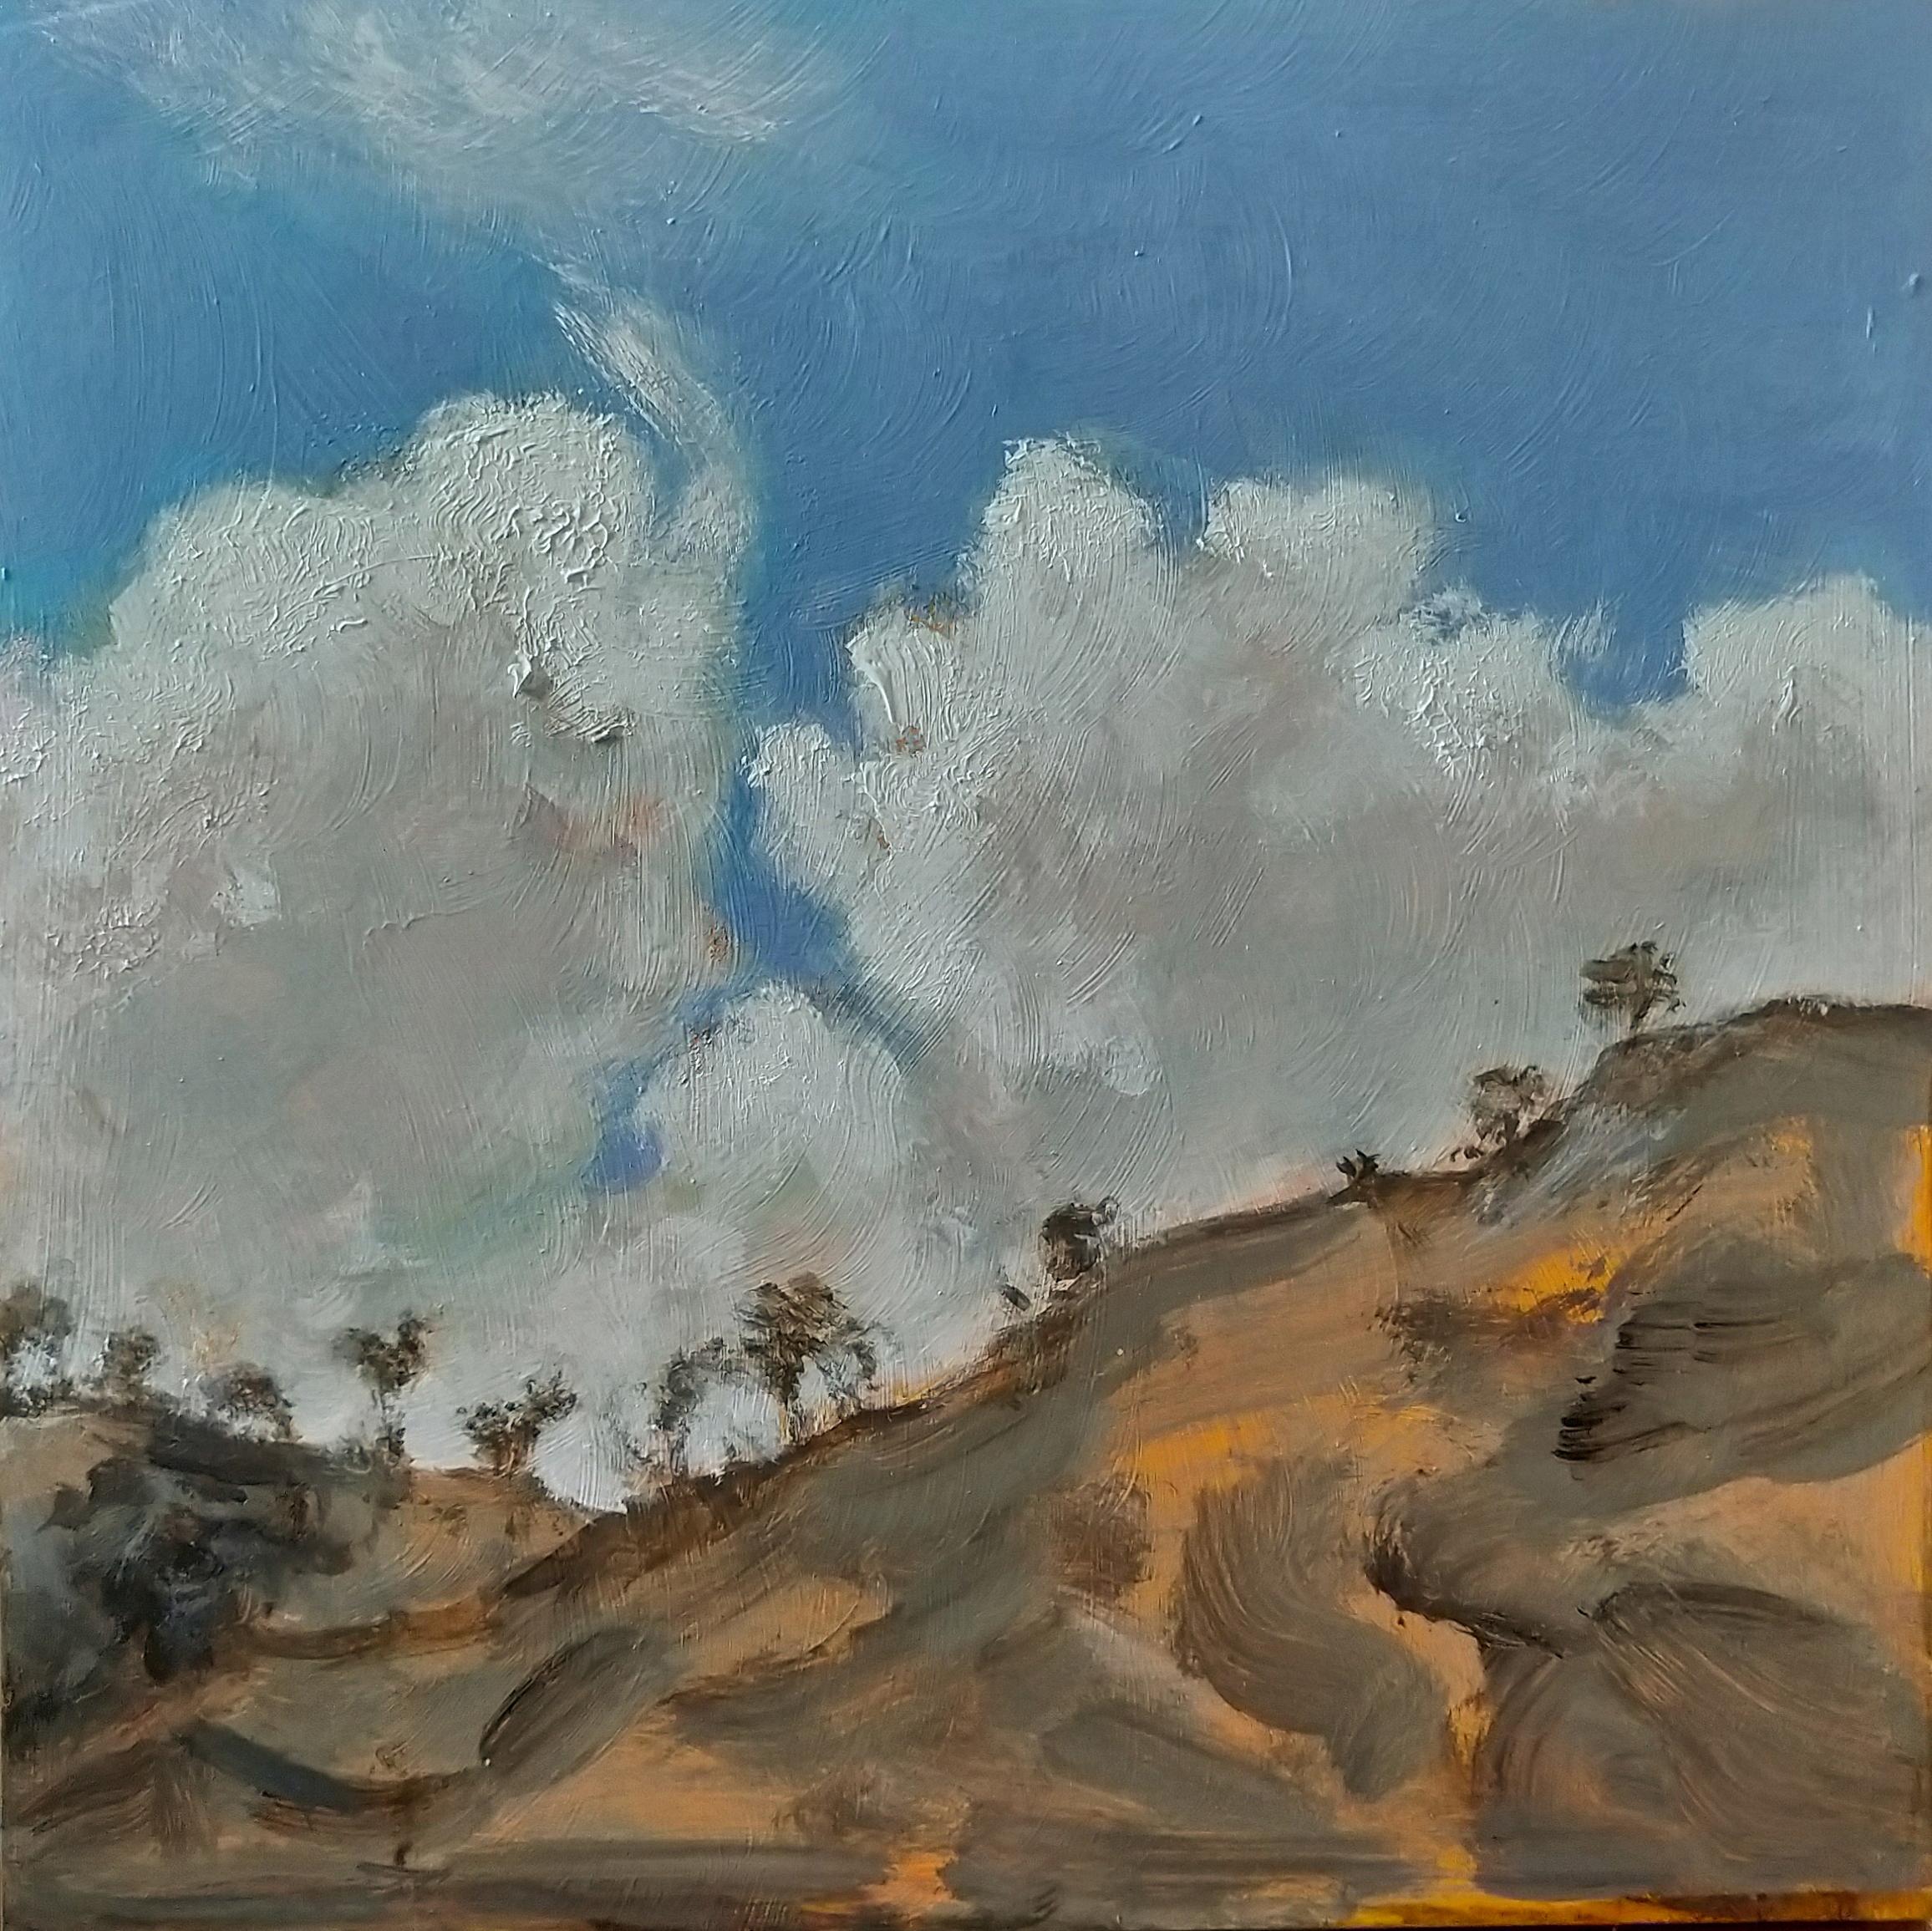 High Hill. 2019. Acrylic on birch wood panel. 30 x 30 cm. $2,400